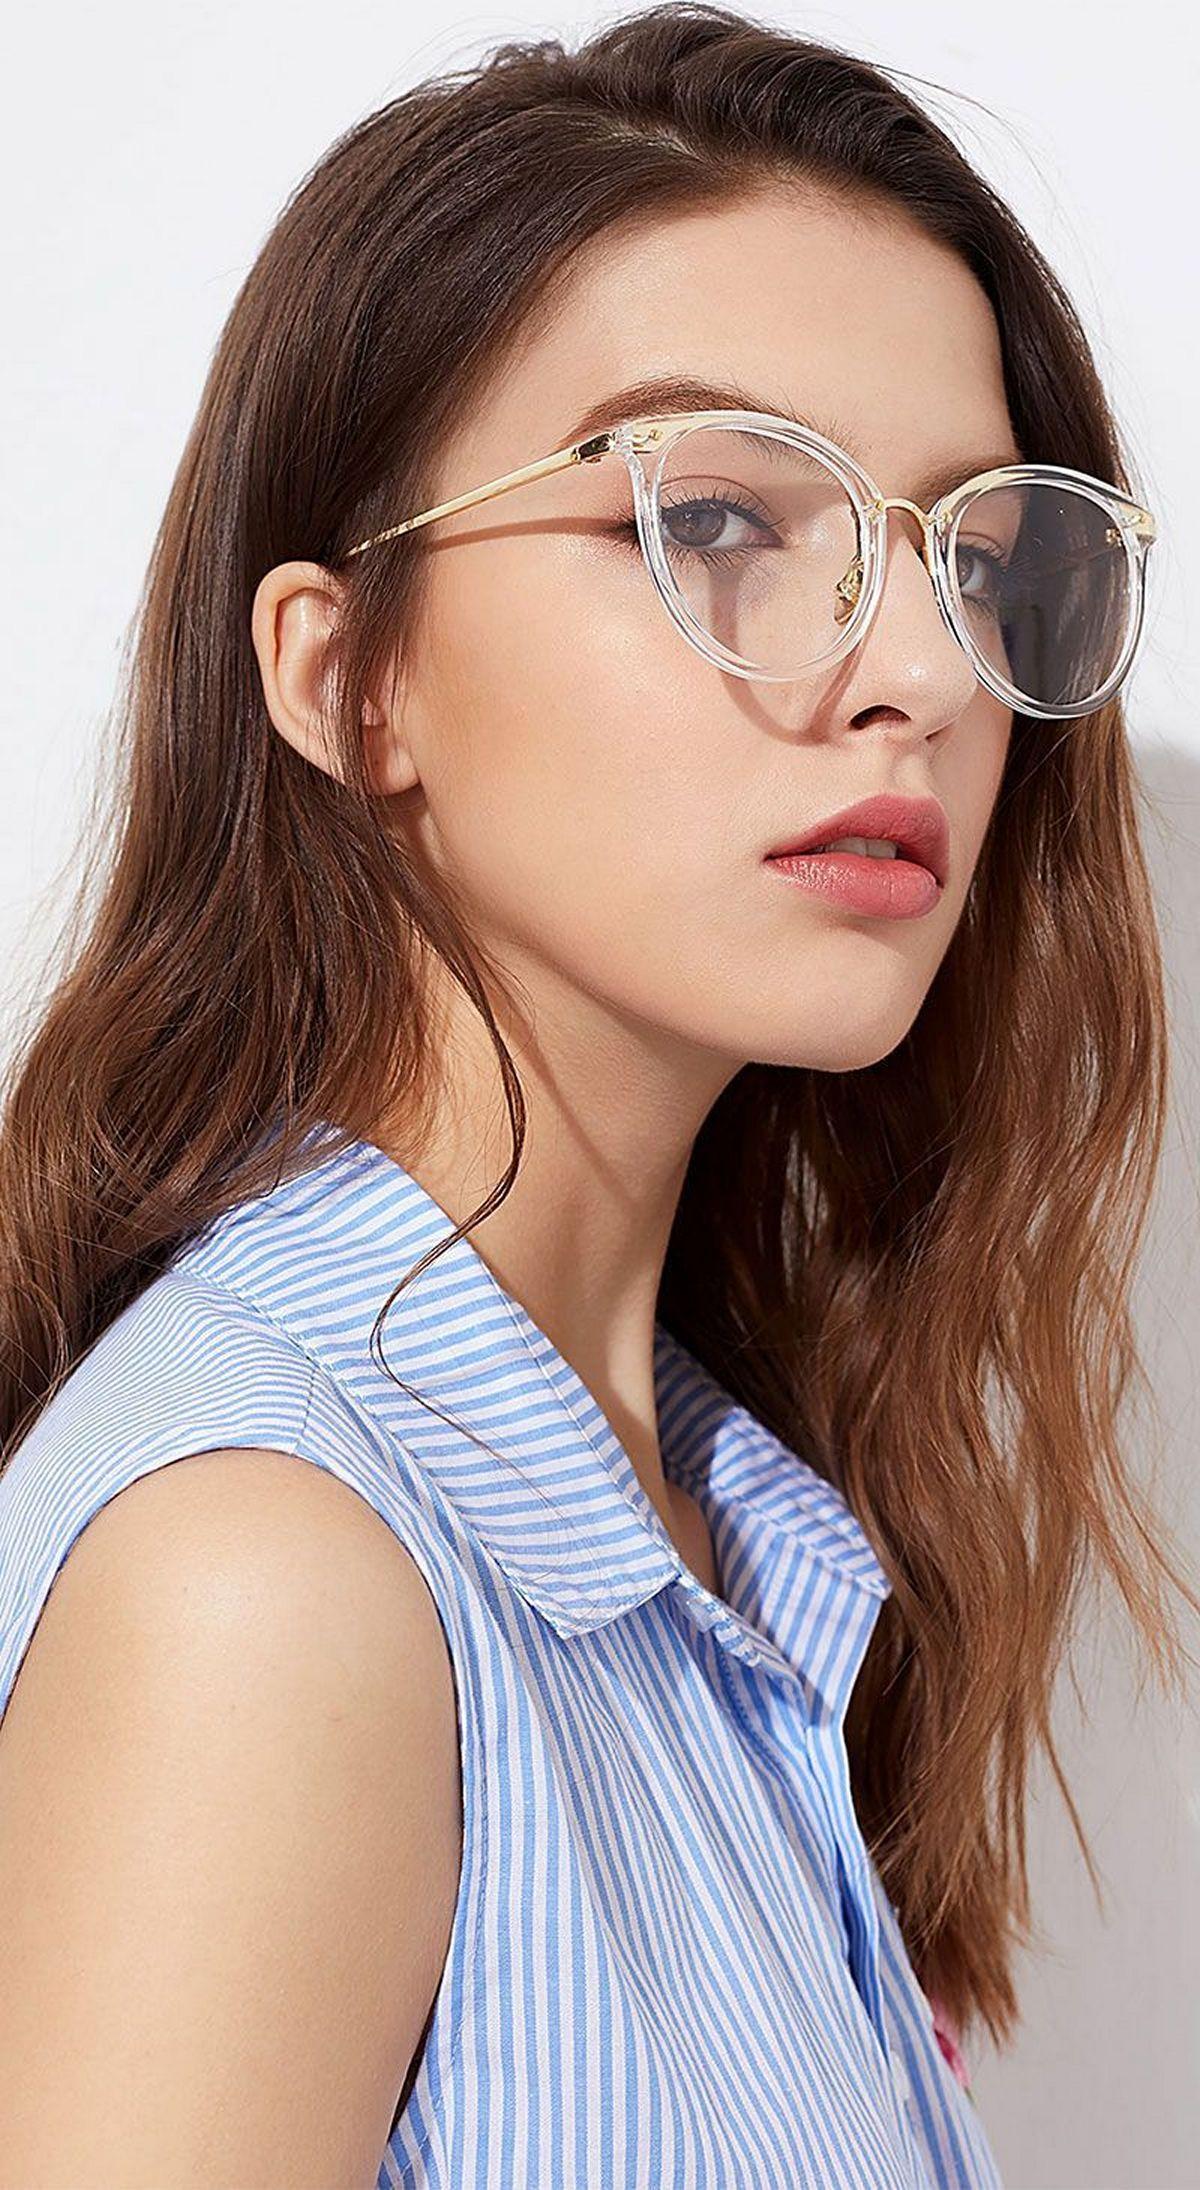 9635d237d6 Impressive 51 Clear Glasses Frame for Women s Fashion Ideas